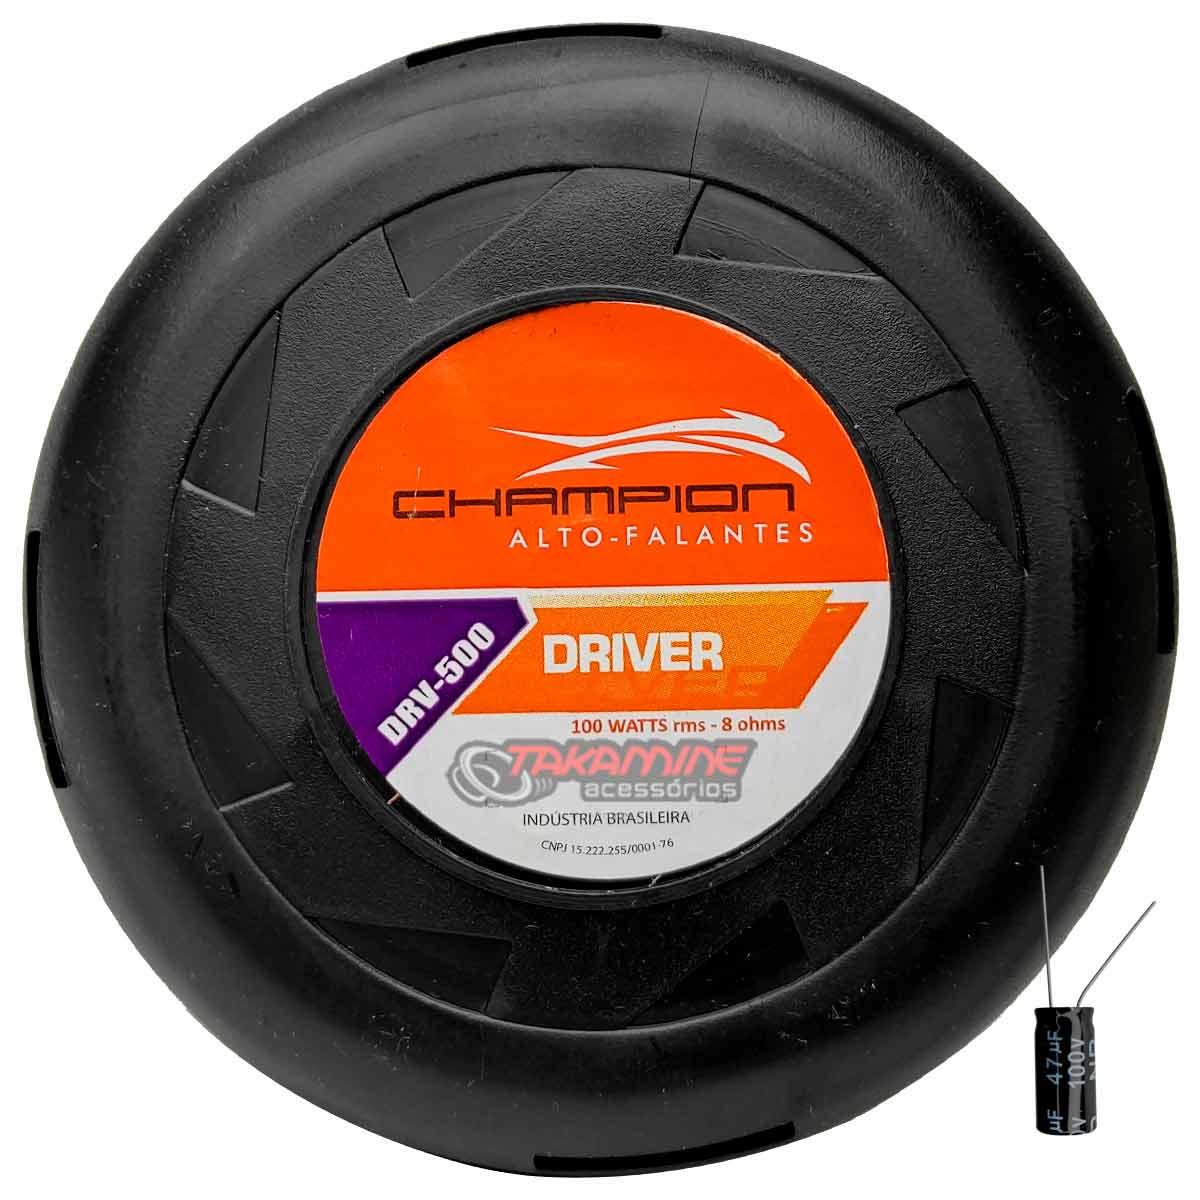 Driver Champion DVR 500 100WRMS + Corneta + Capacitor